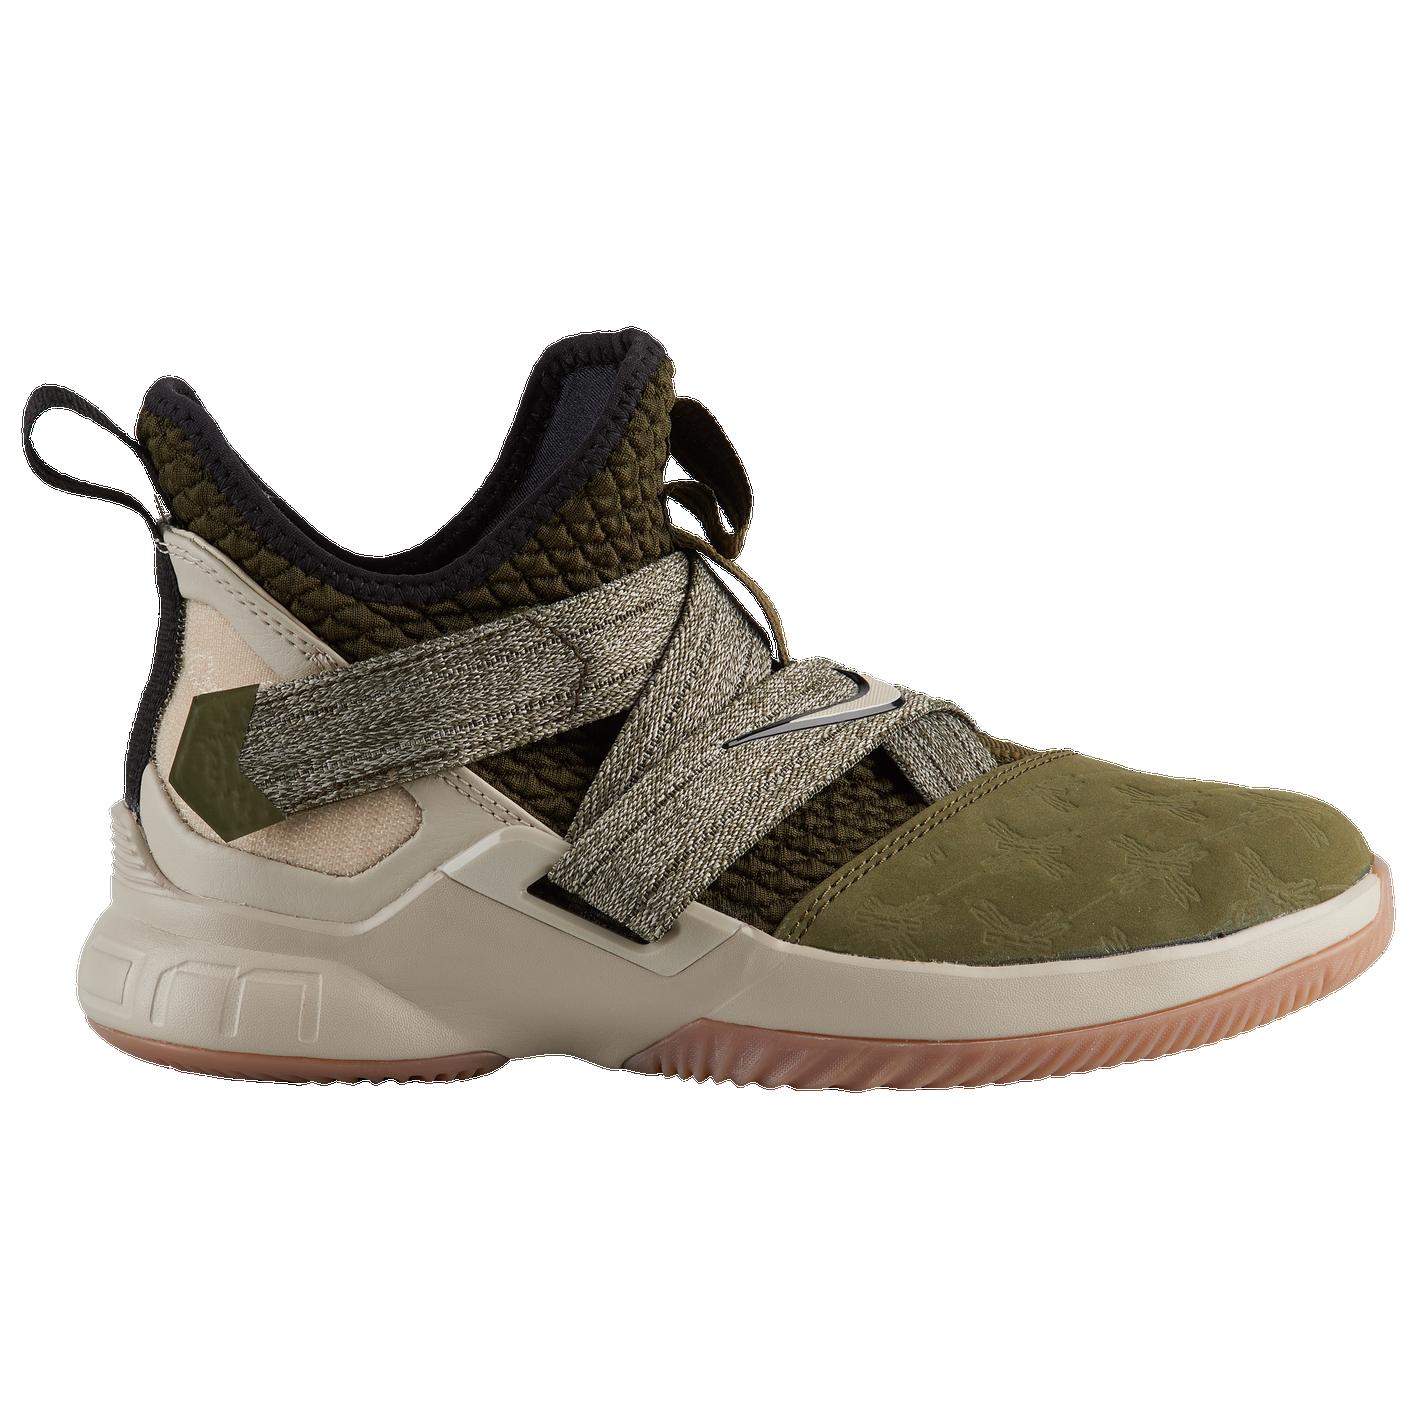 Nike LeBron Soldier XII - Boys  Grade School - Basketball - Shoes ... 62c67e8cf